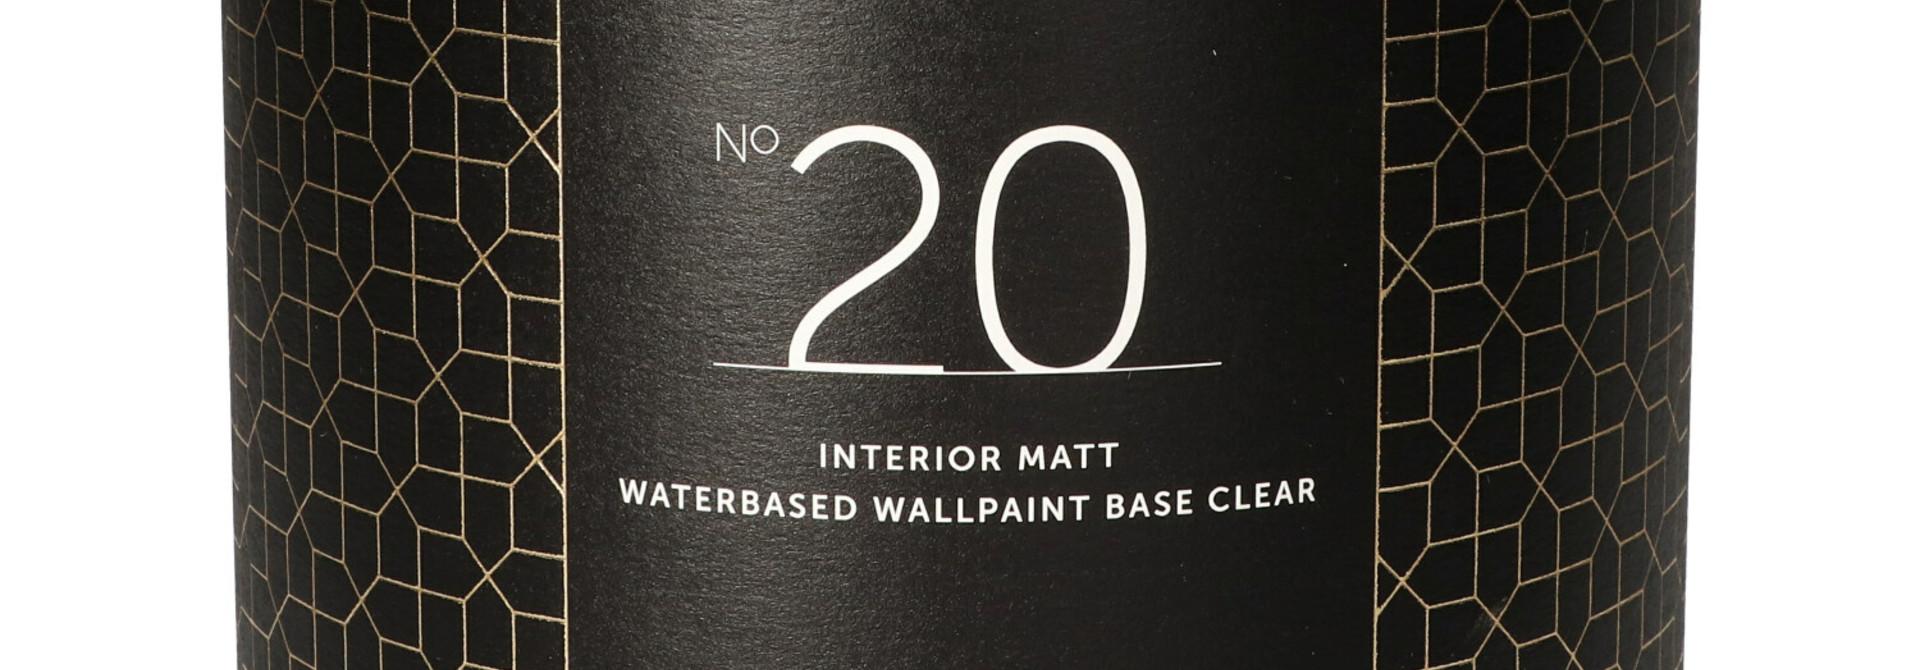 No. 20 INTERIOR SEALER - 2,5L